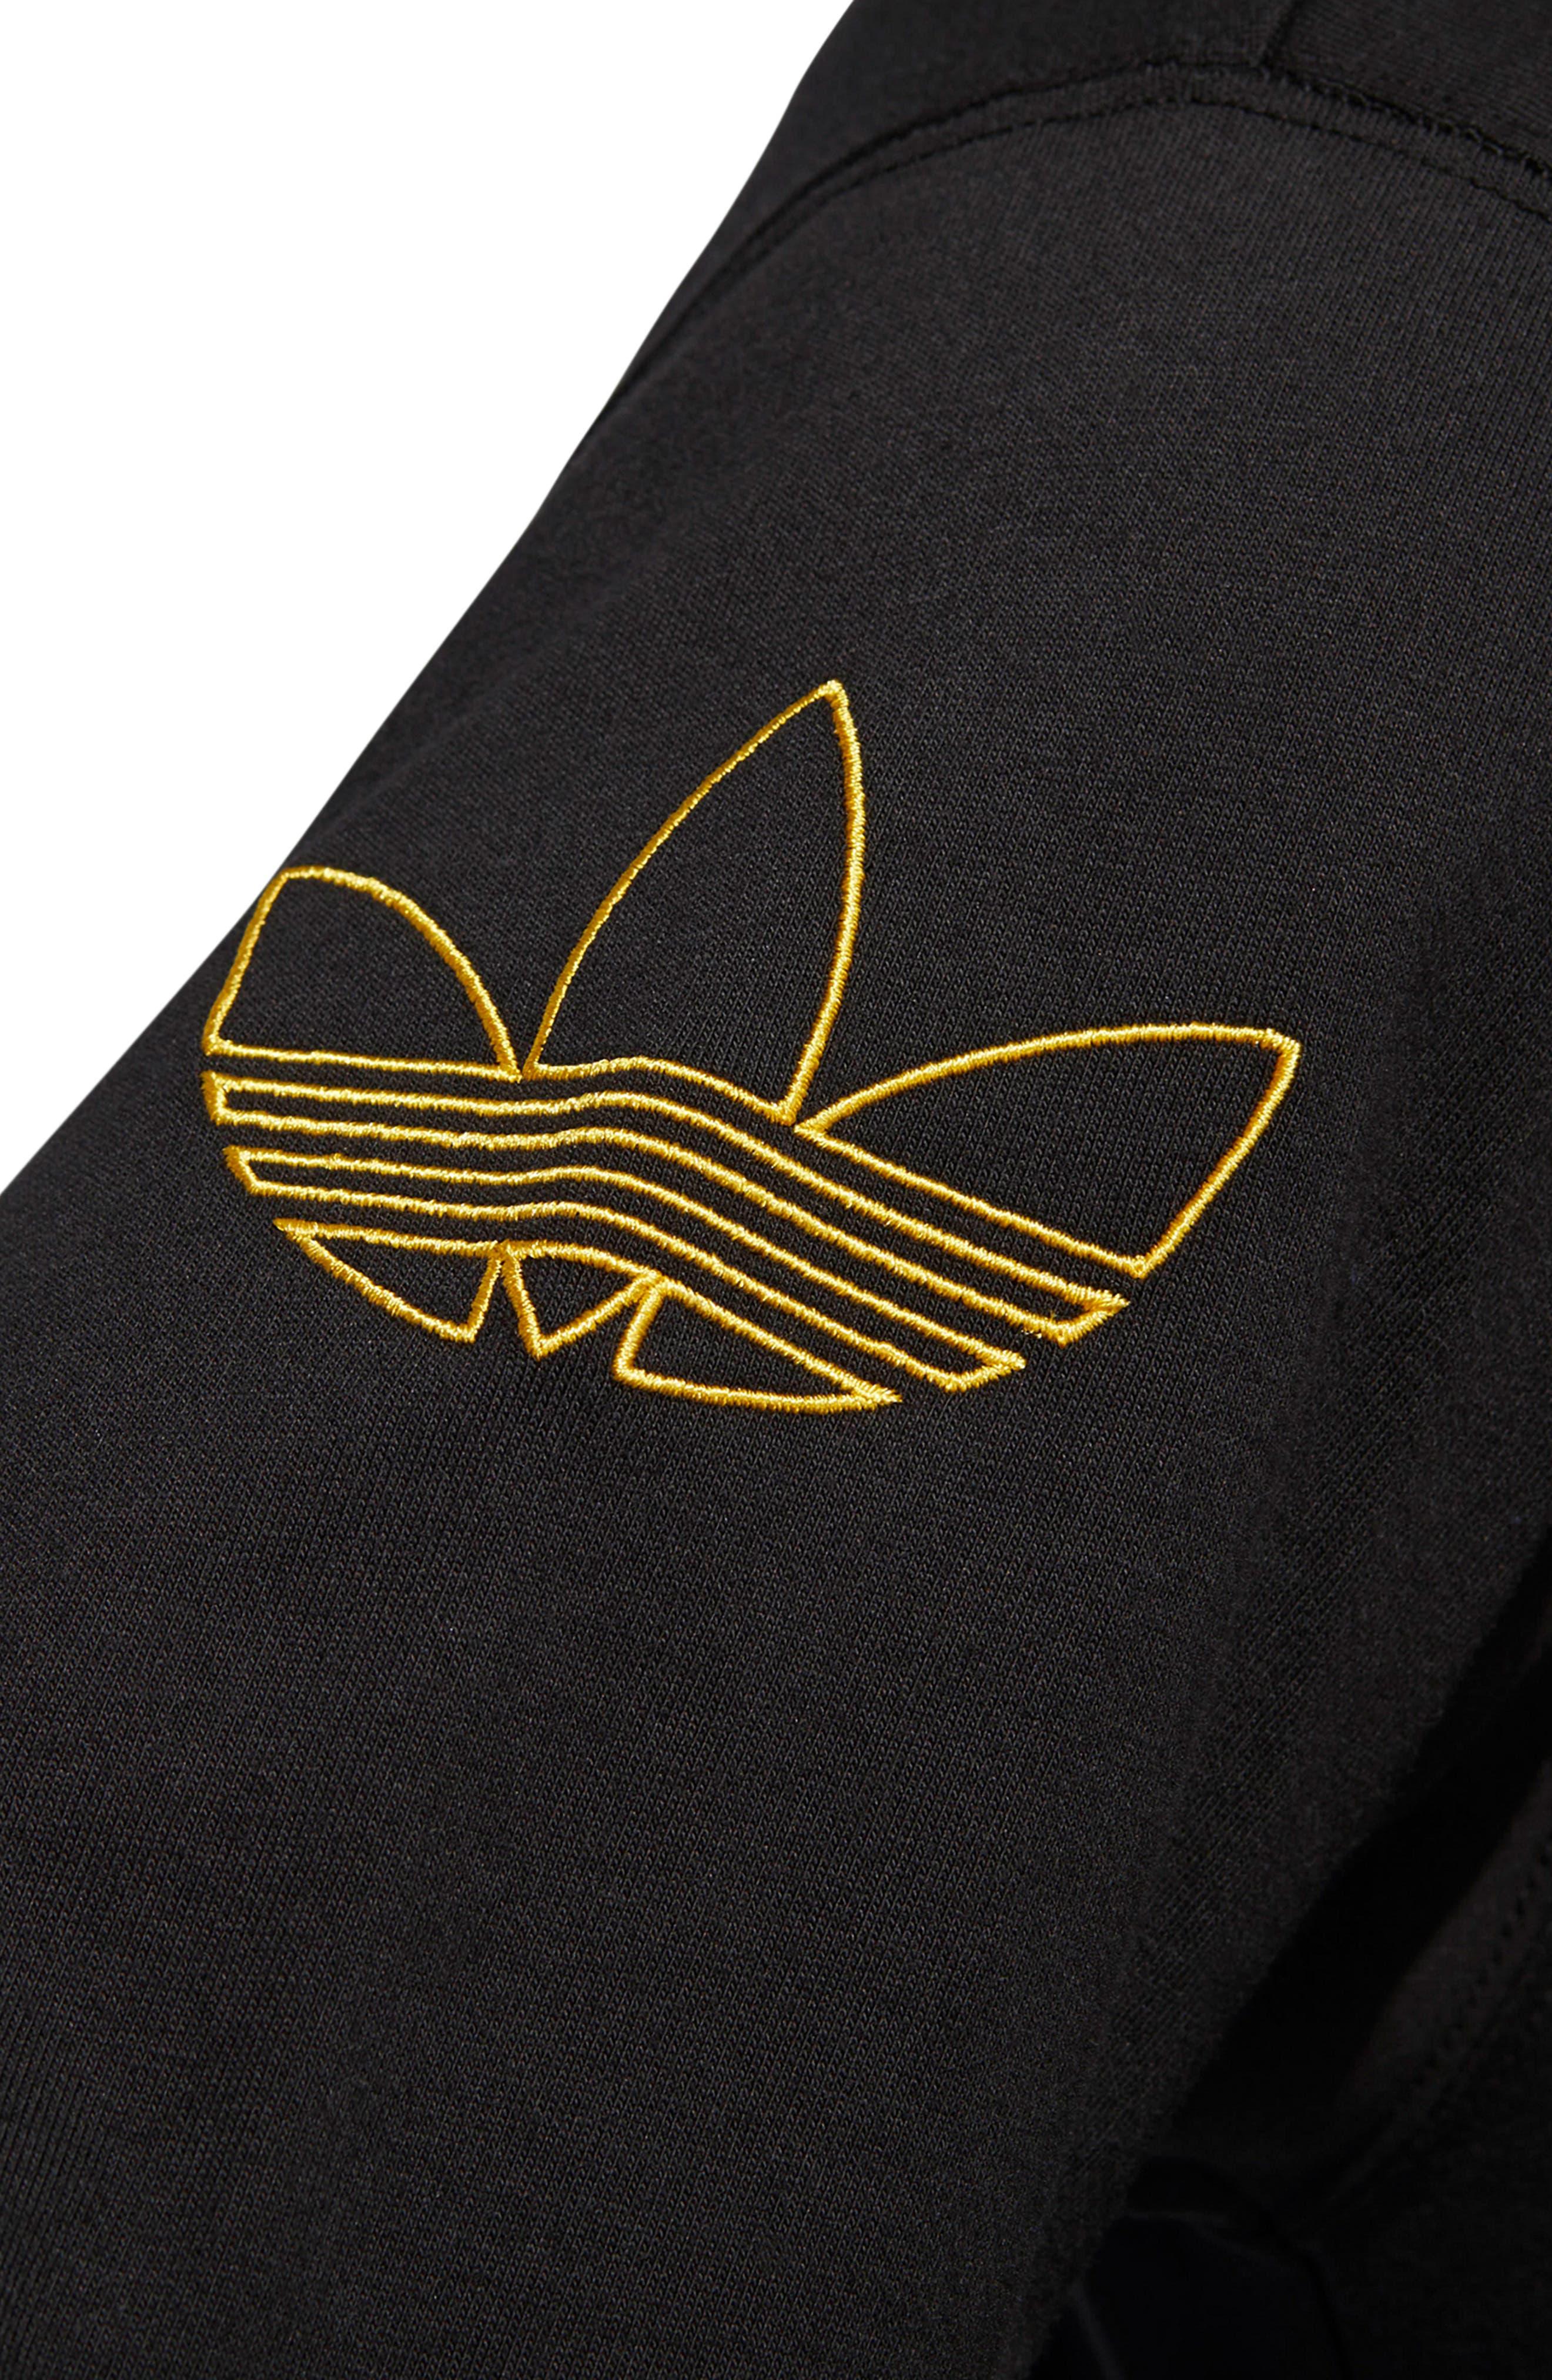 ADIDAS ORIGINALS, Embroidered Trefoil Long Sleeve T-Shirt, Alternate thumbnail 4, color, BLACK/ WHITE